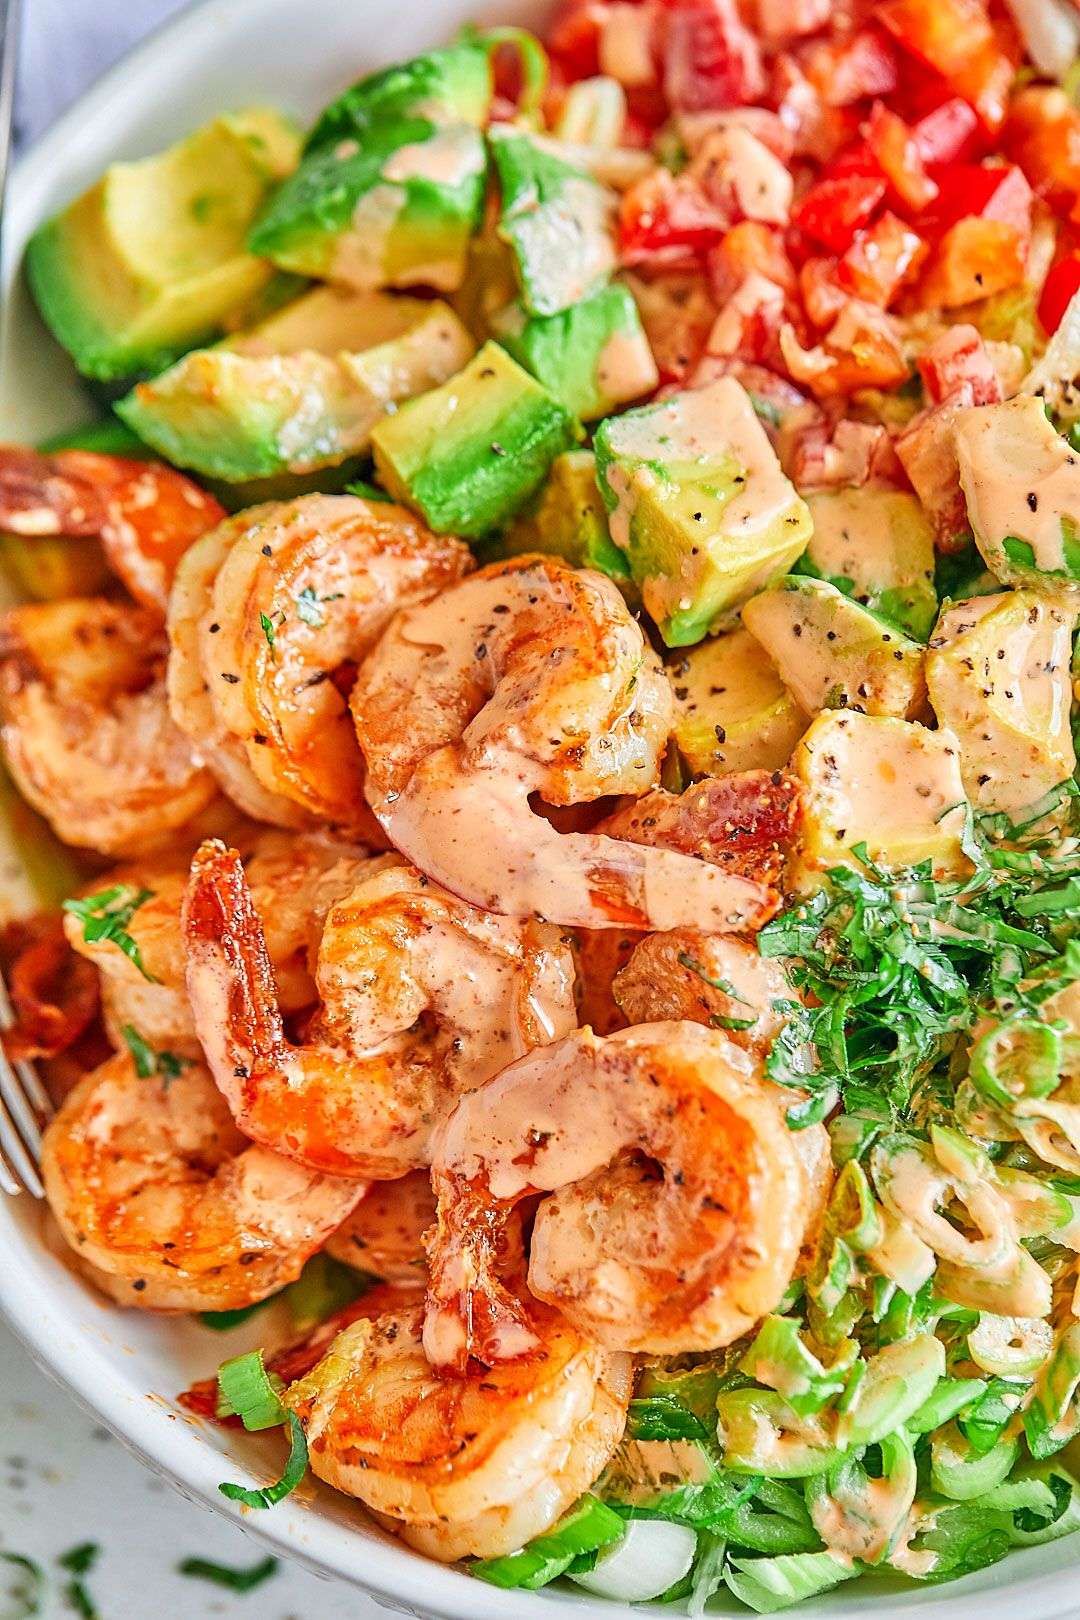 Photo of Healthy Lettuce Shrimp Avocado Salad